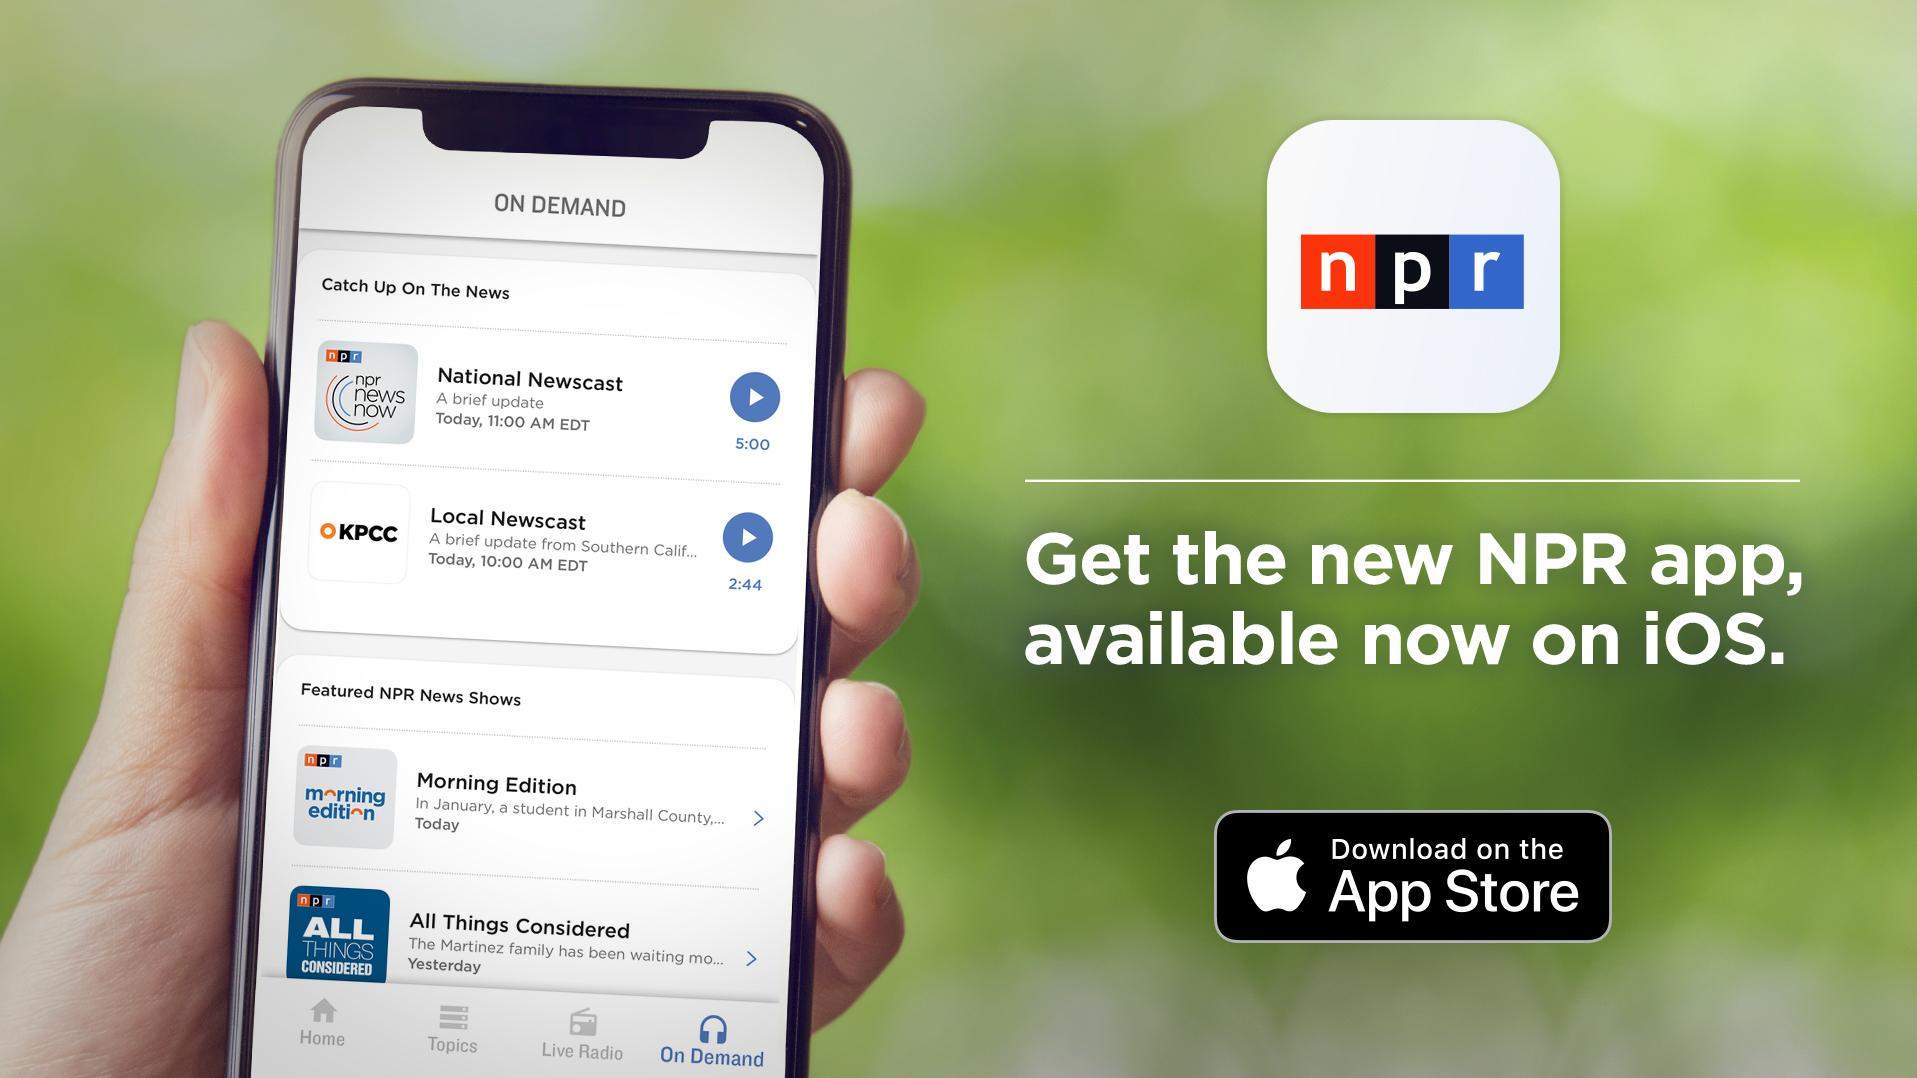 dating sites reviews npr news app download